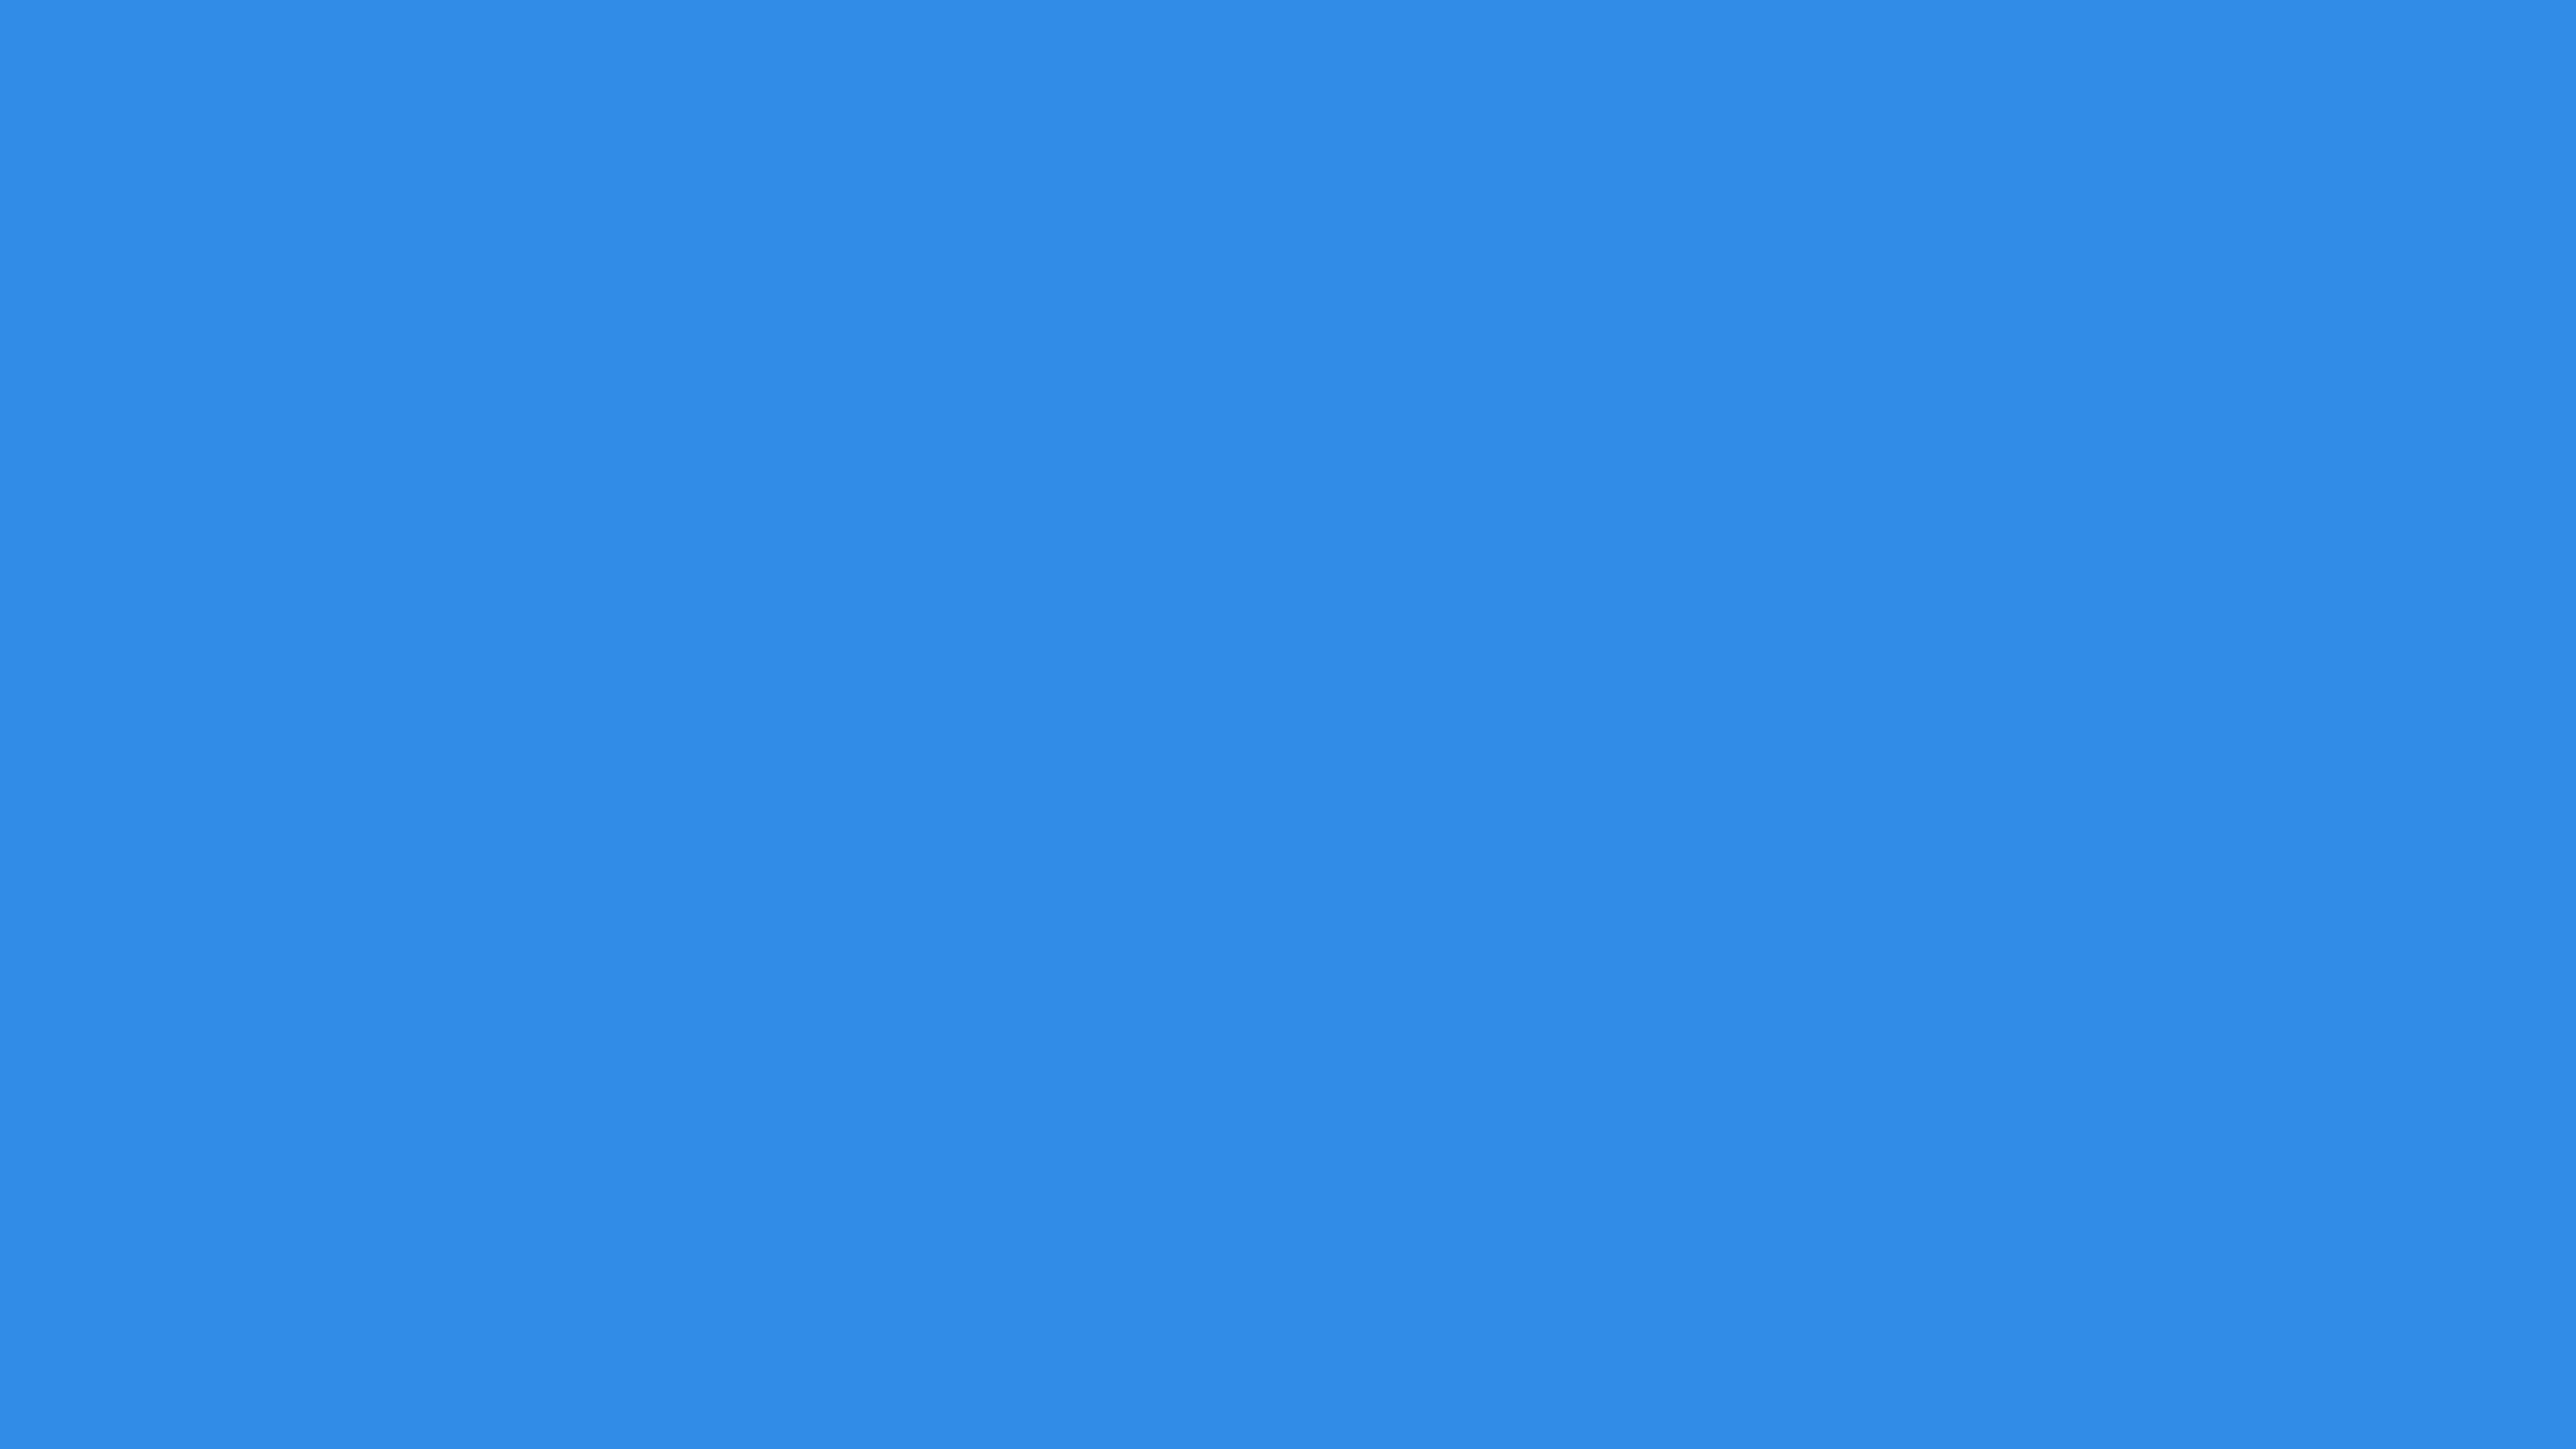 3840x2160 Bleu De France Solid Color Background